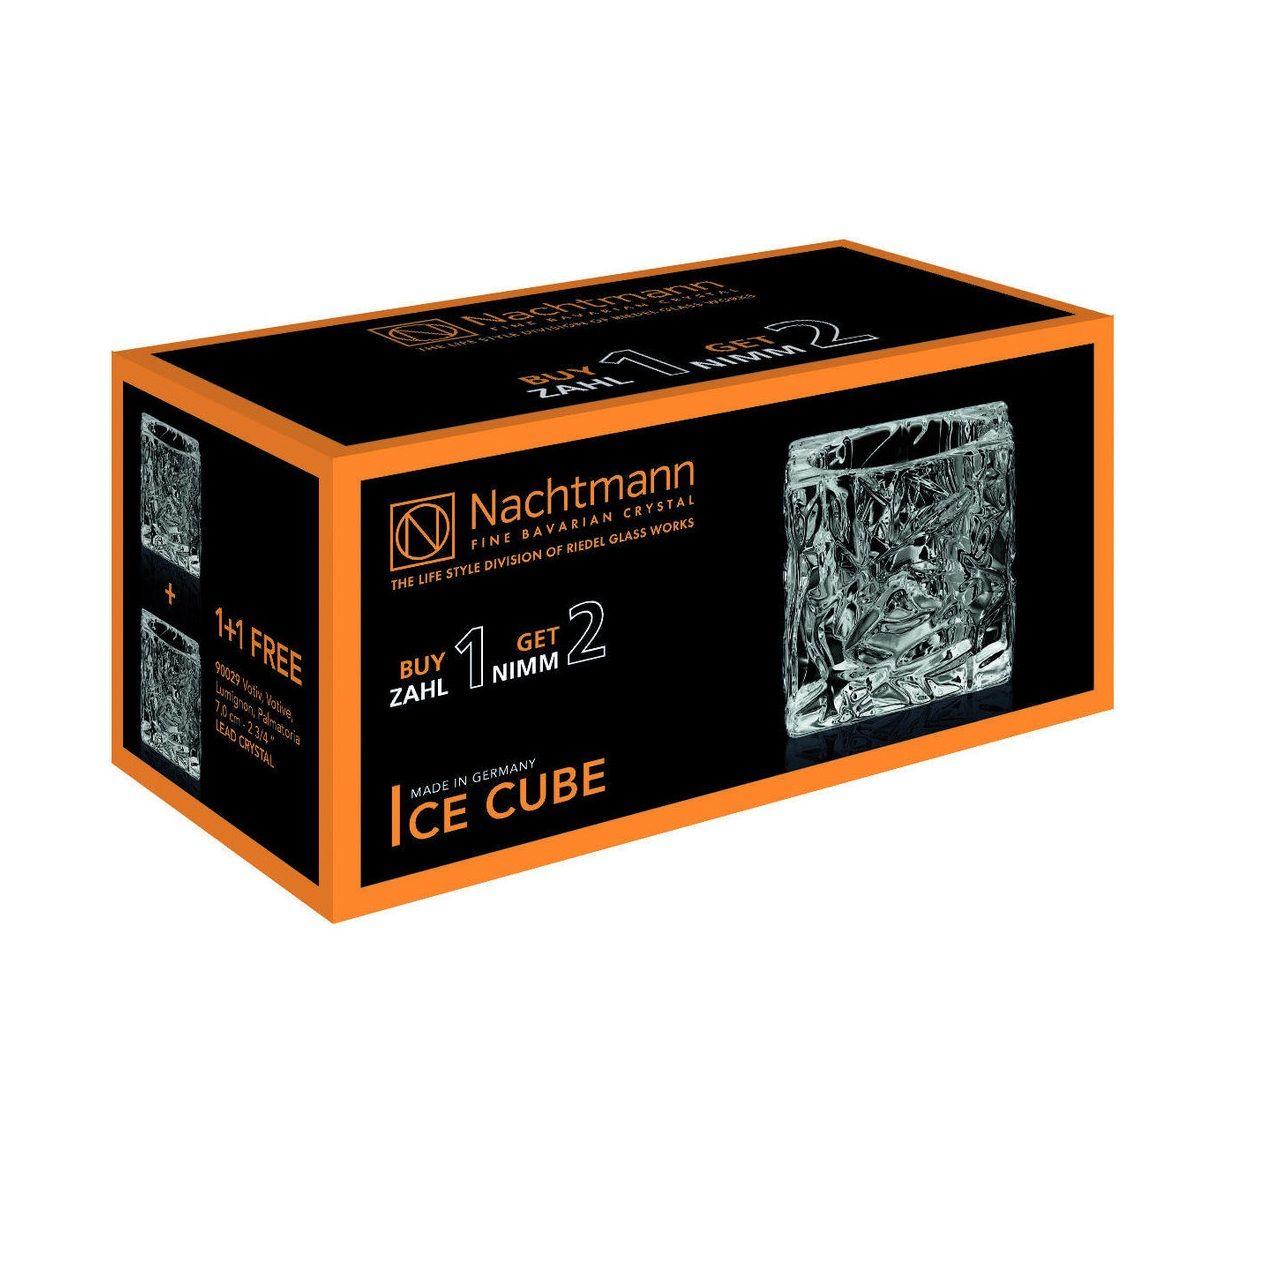 Nachtmann обзор коробка Ice cube